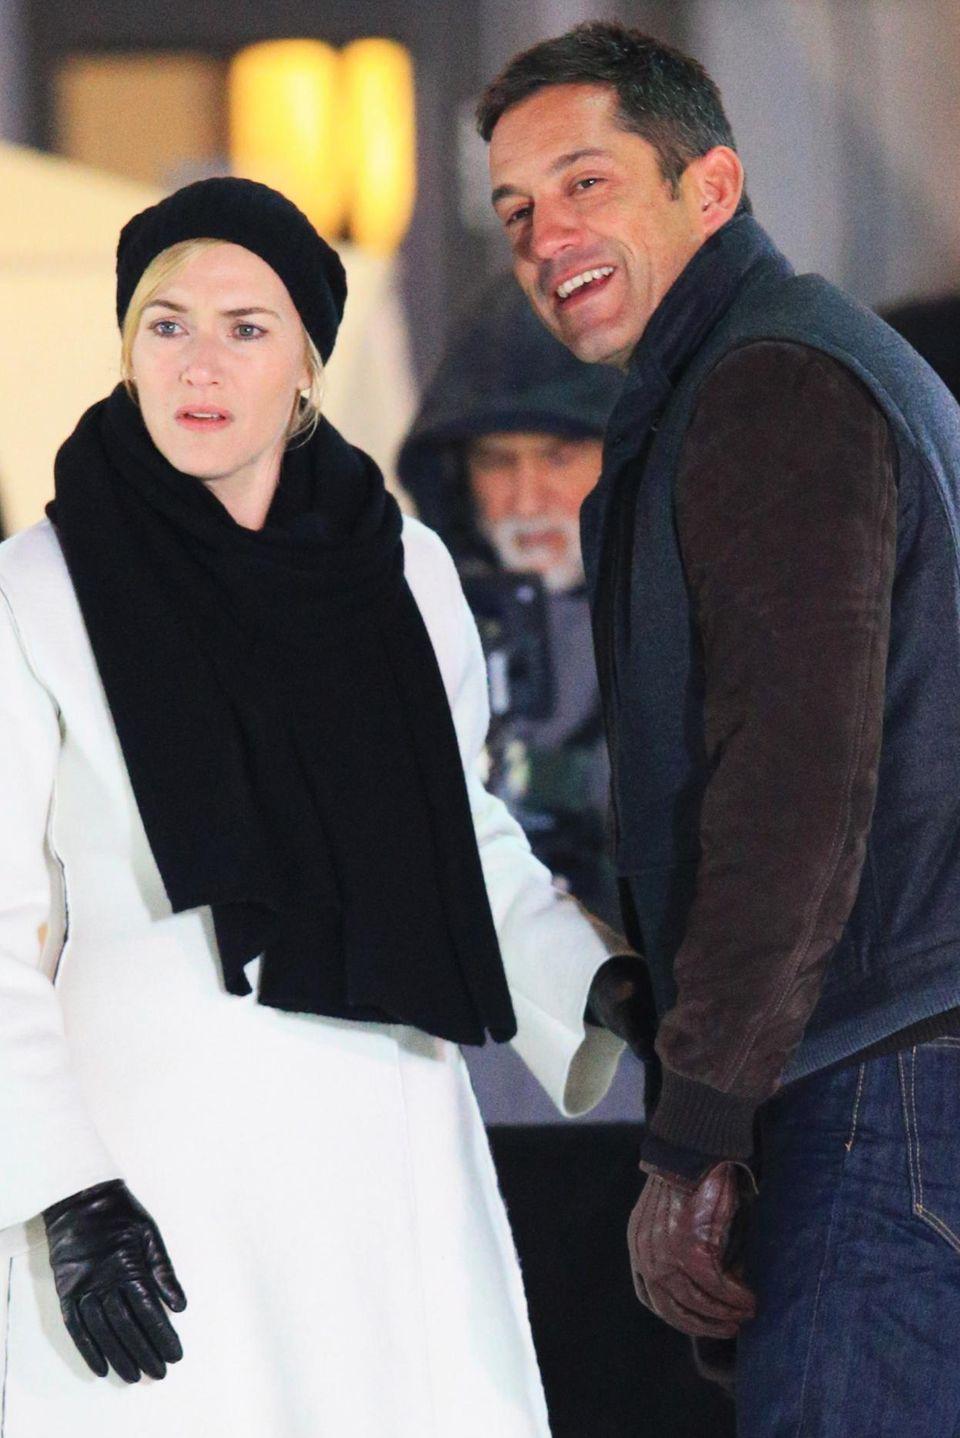 Kate Winslet + Enrique Murciano